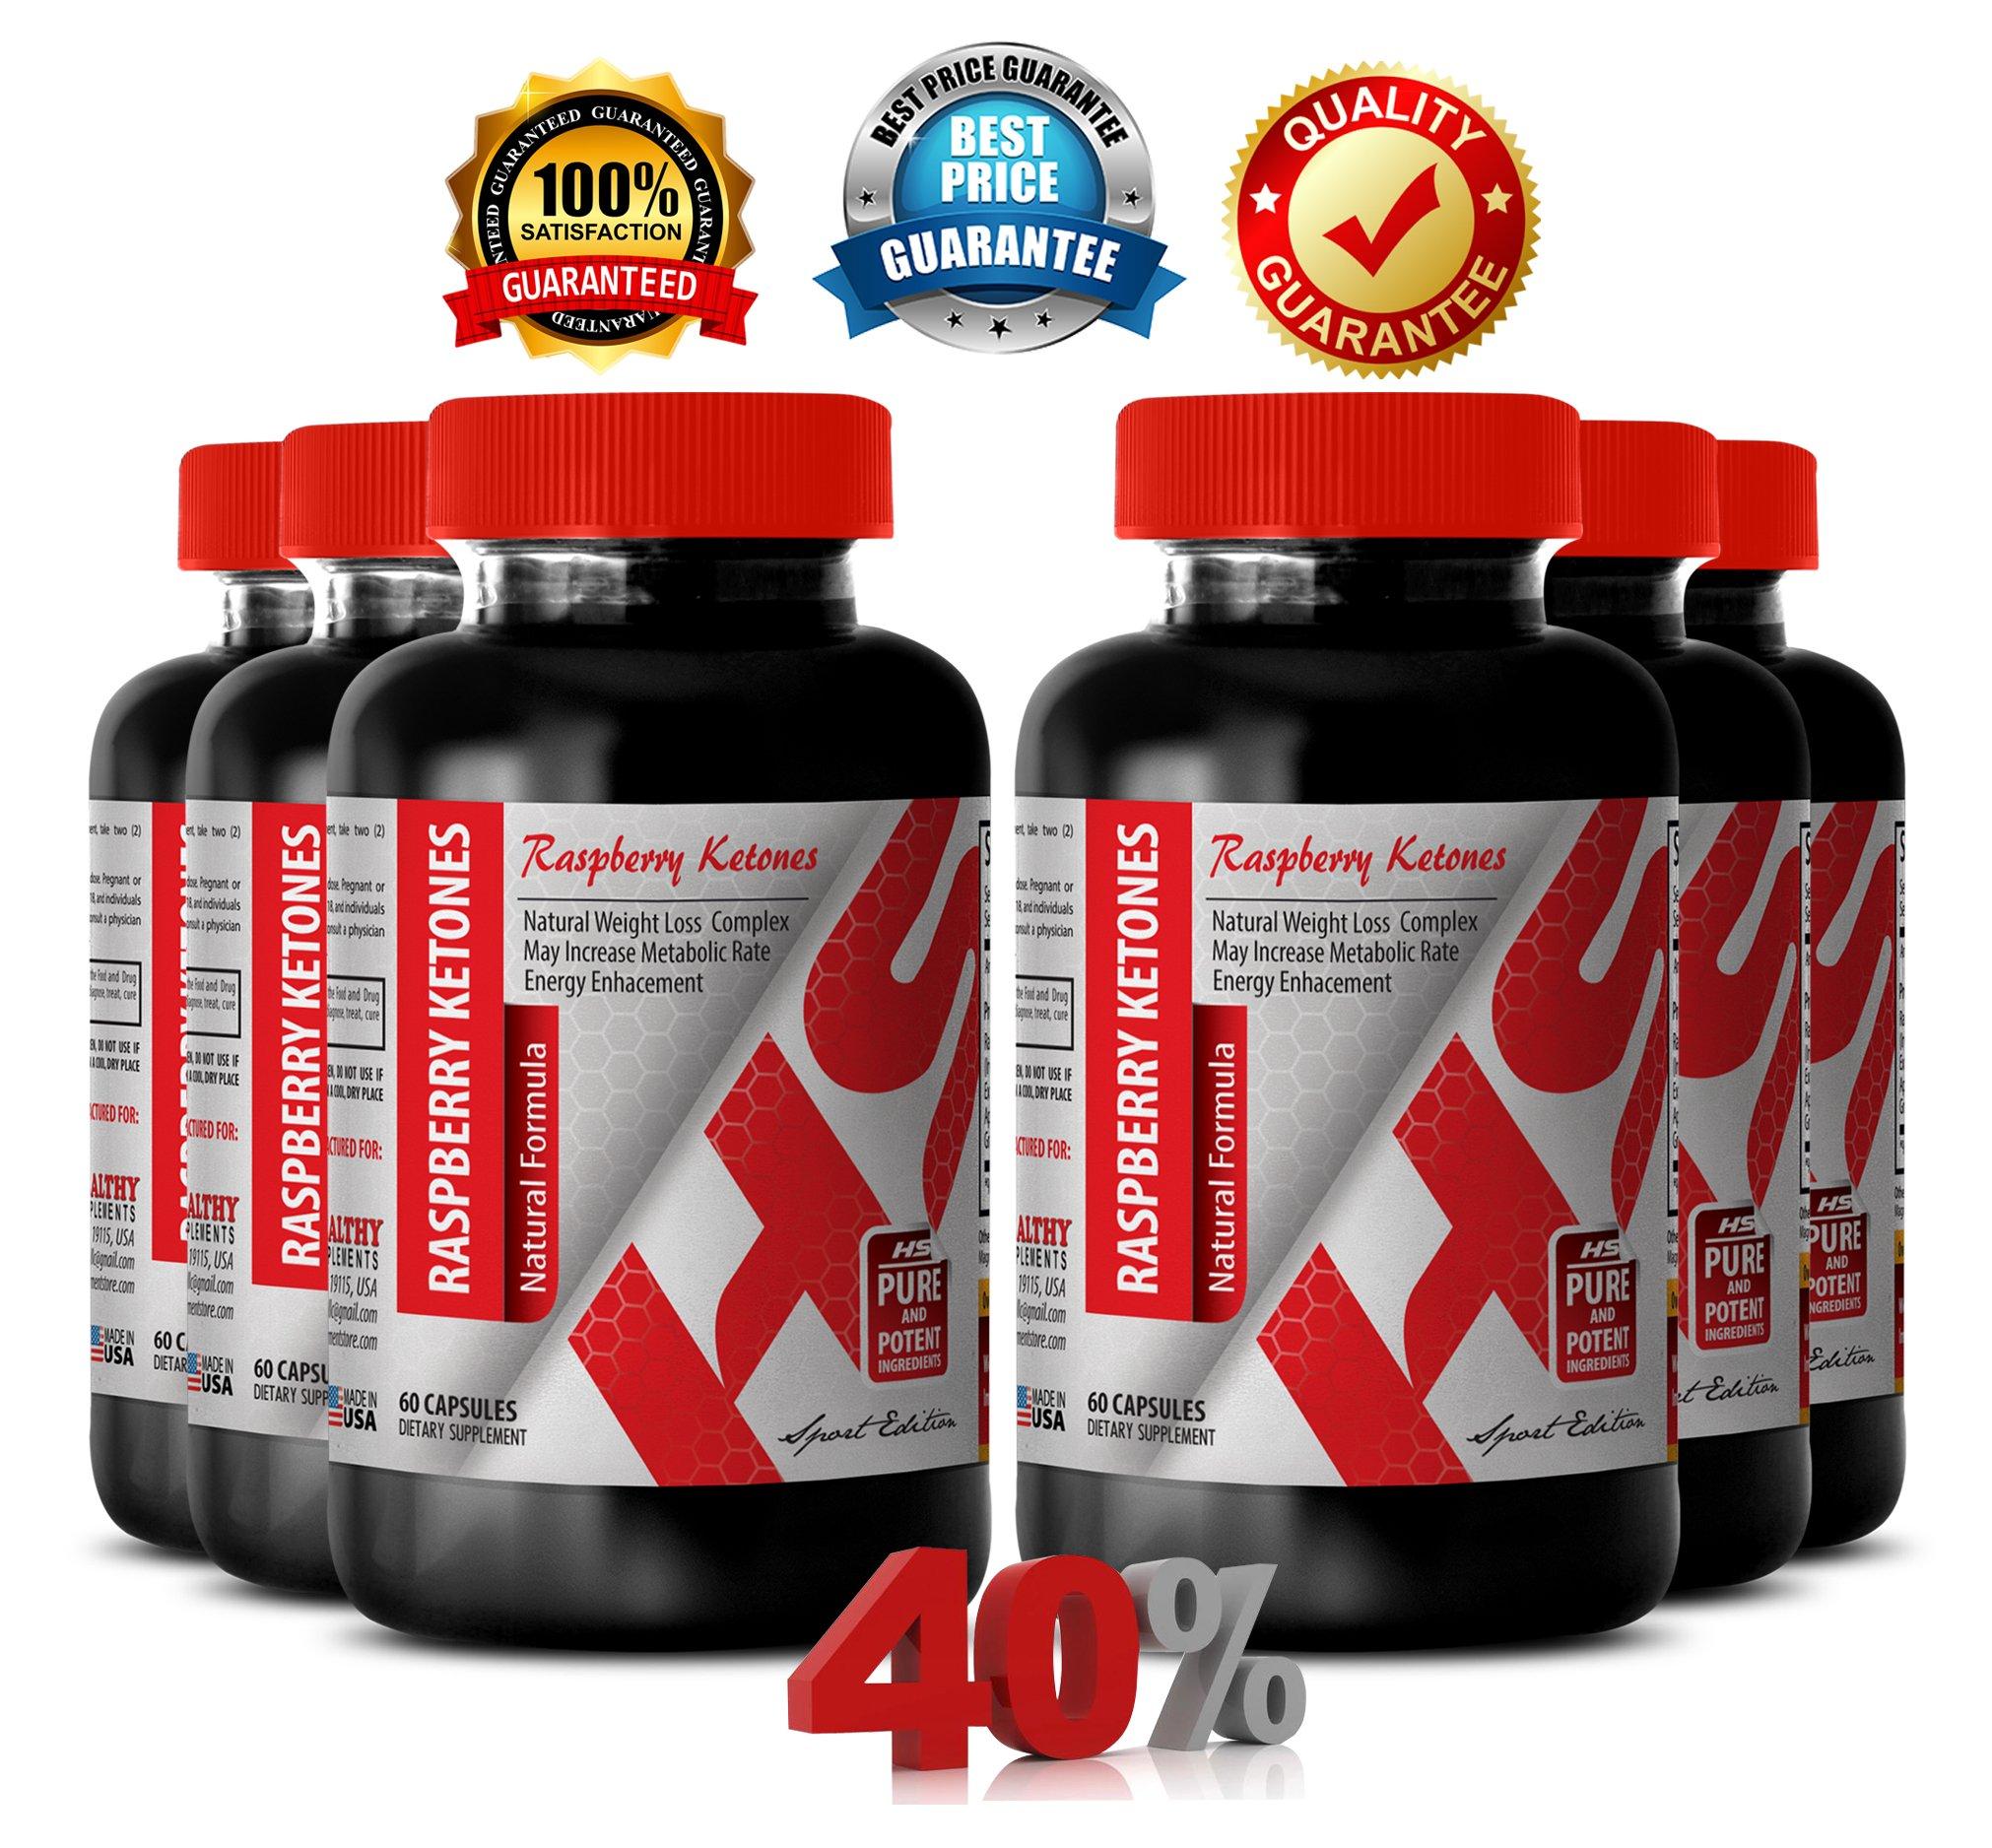 Raspberry ketones extract - RASPBERRY KETONES NATURAL FORMULA 1200 MG - improve eye vision (6 Bottles) by Healthy Supplements LLC